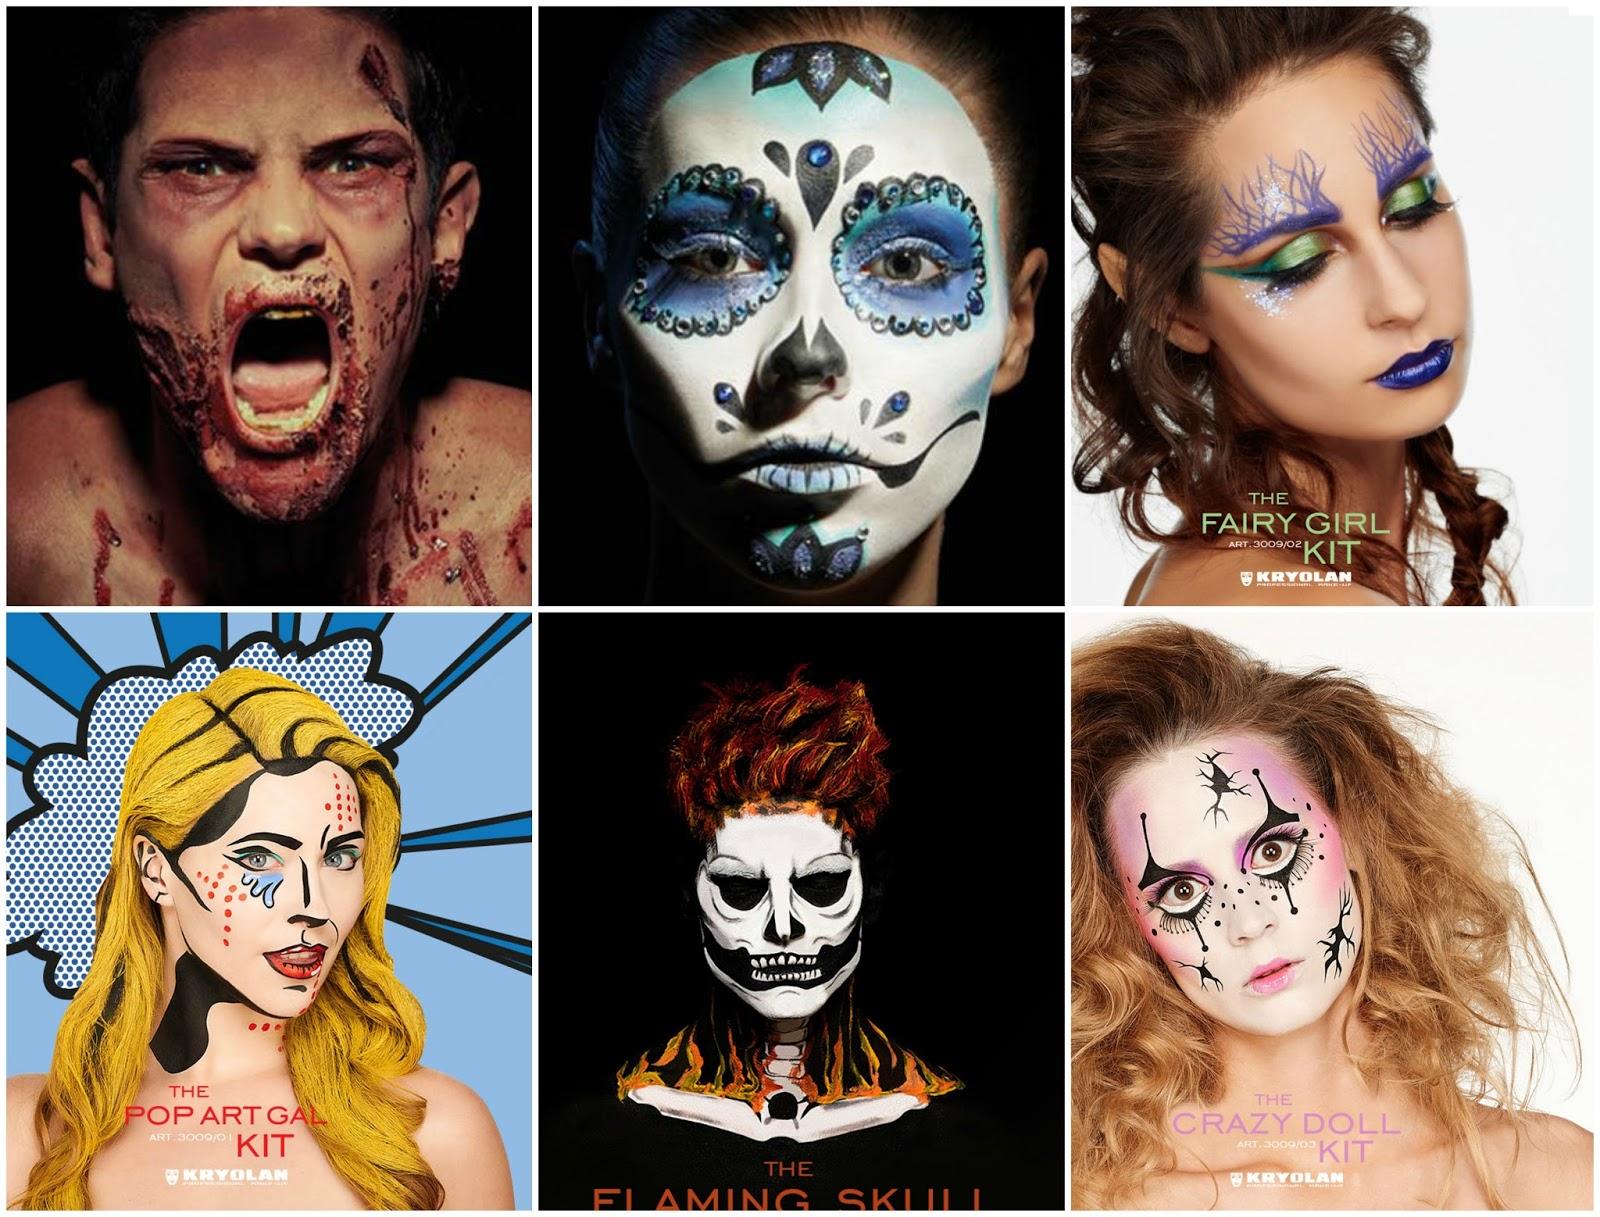 Kryolan Halloween Makeup Sets | All Your Hair Needs